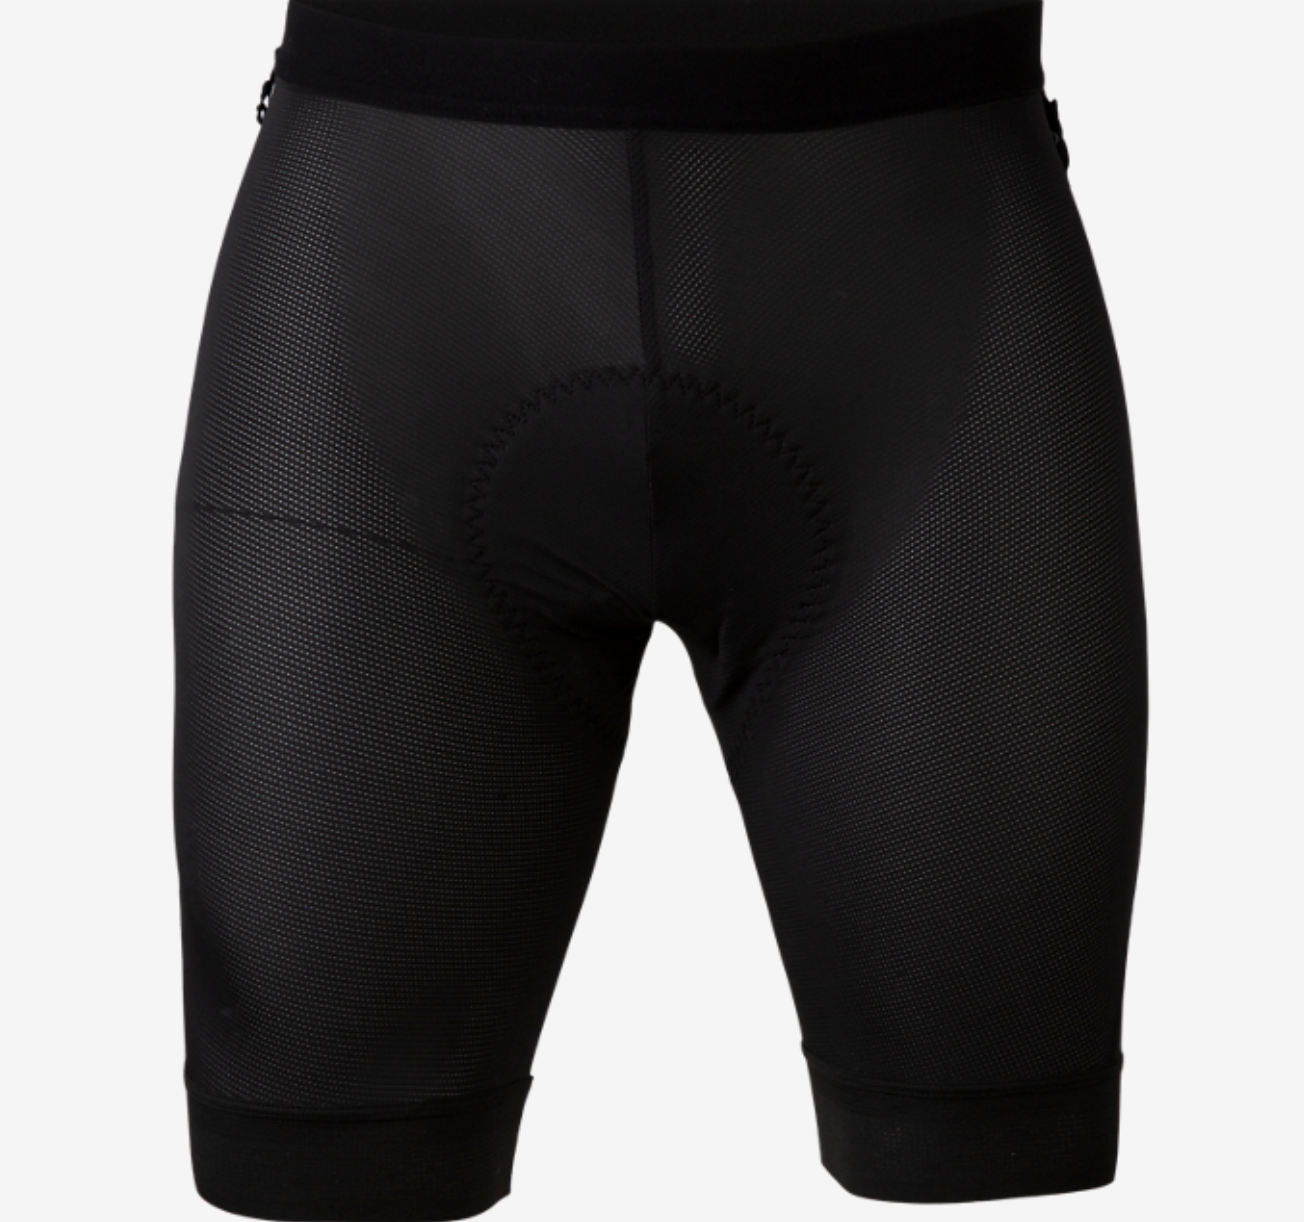 Specialized Mens Enduro Sport Short